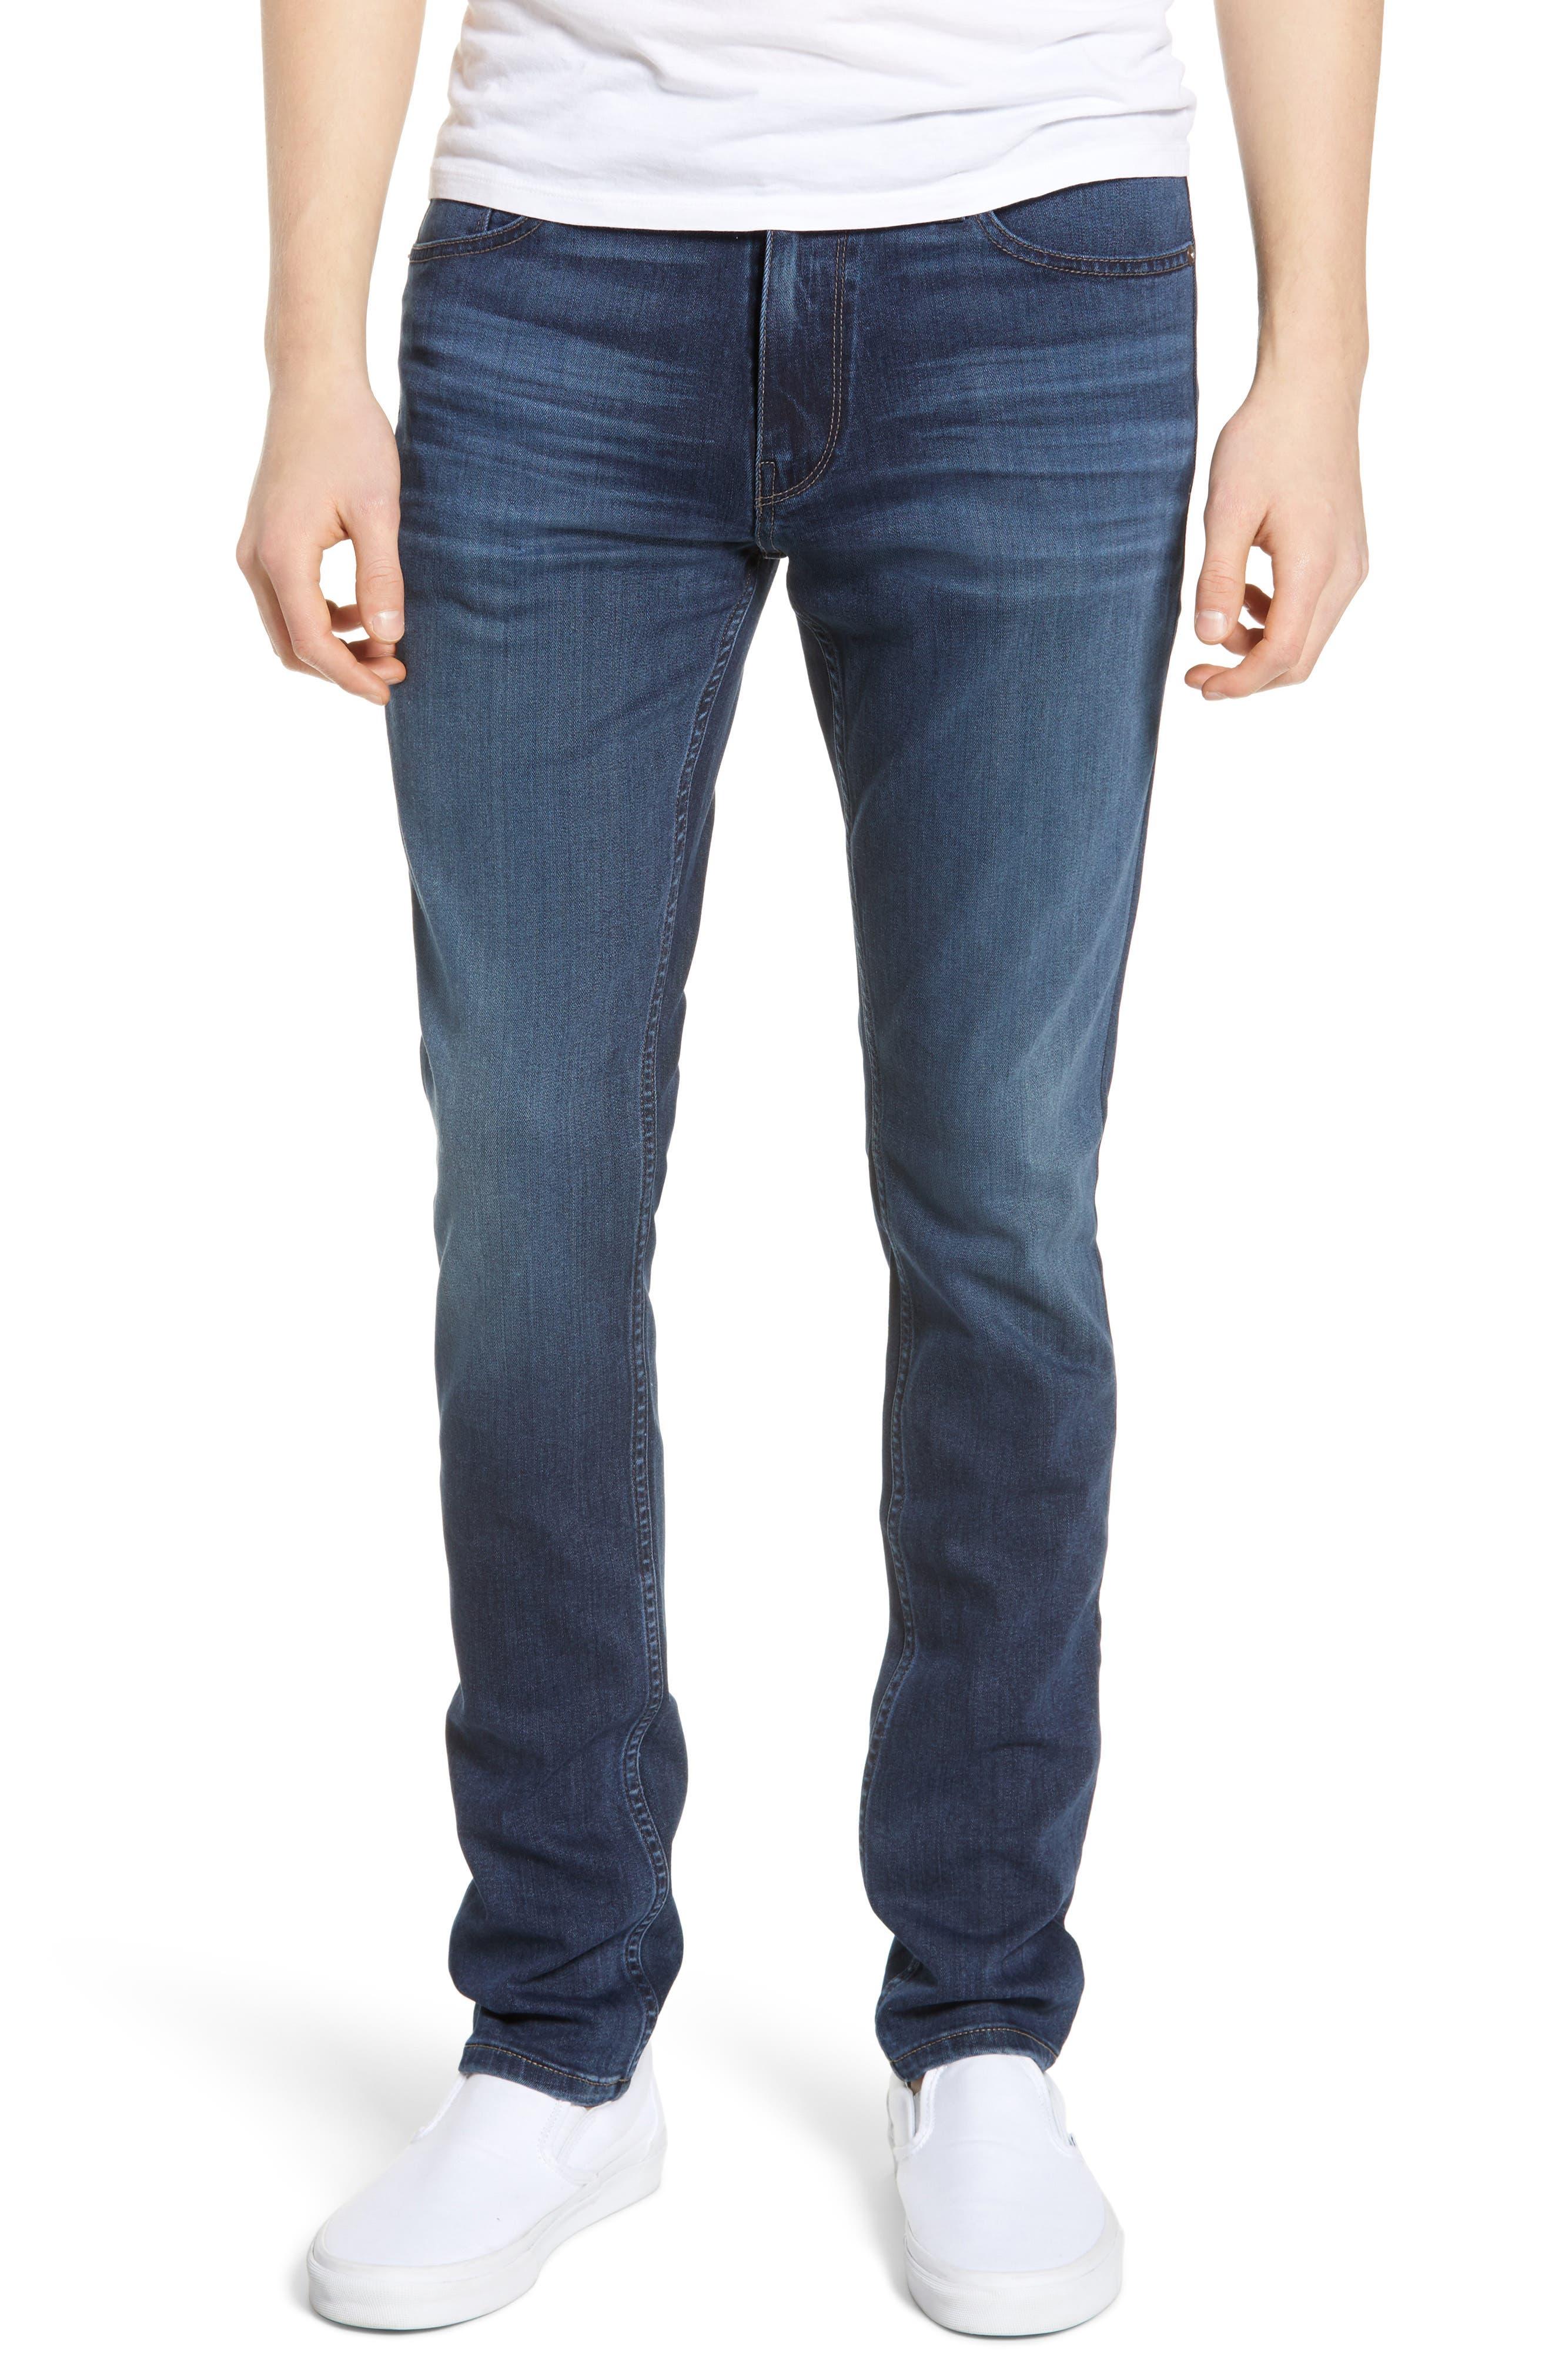 Transcend - Croft Skinny Fit Jeans,                             Main thumbnail 1, color,                             HUXLEY